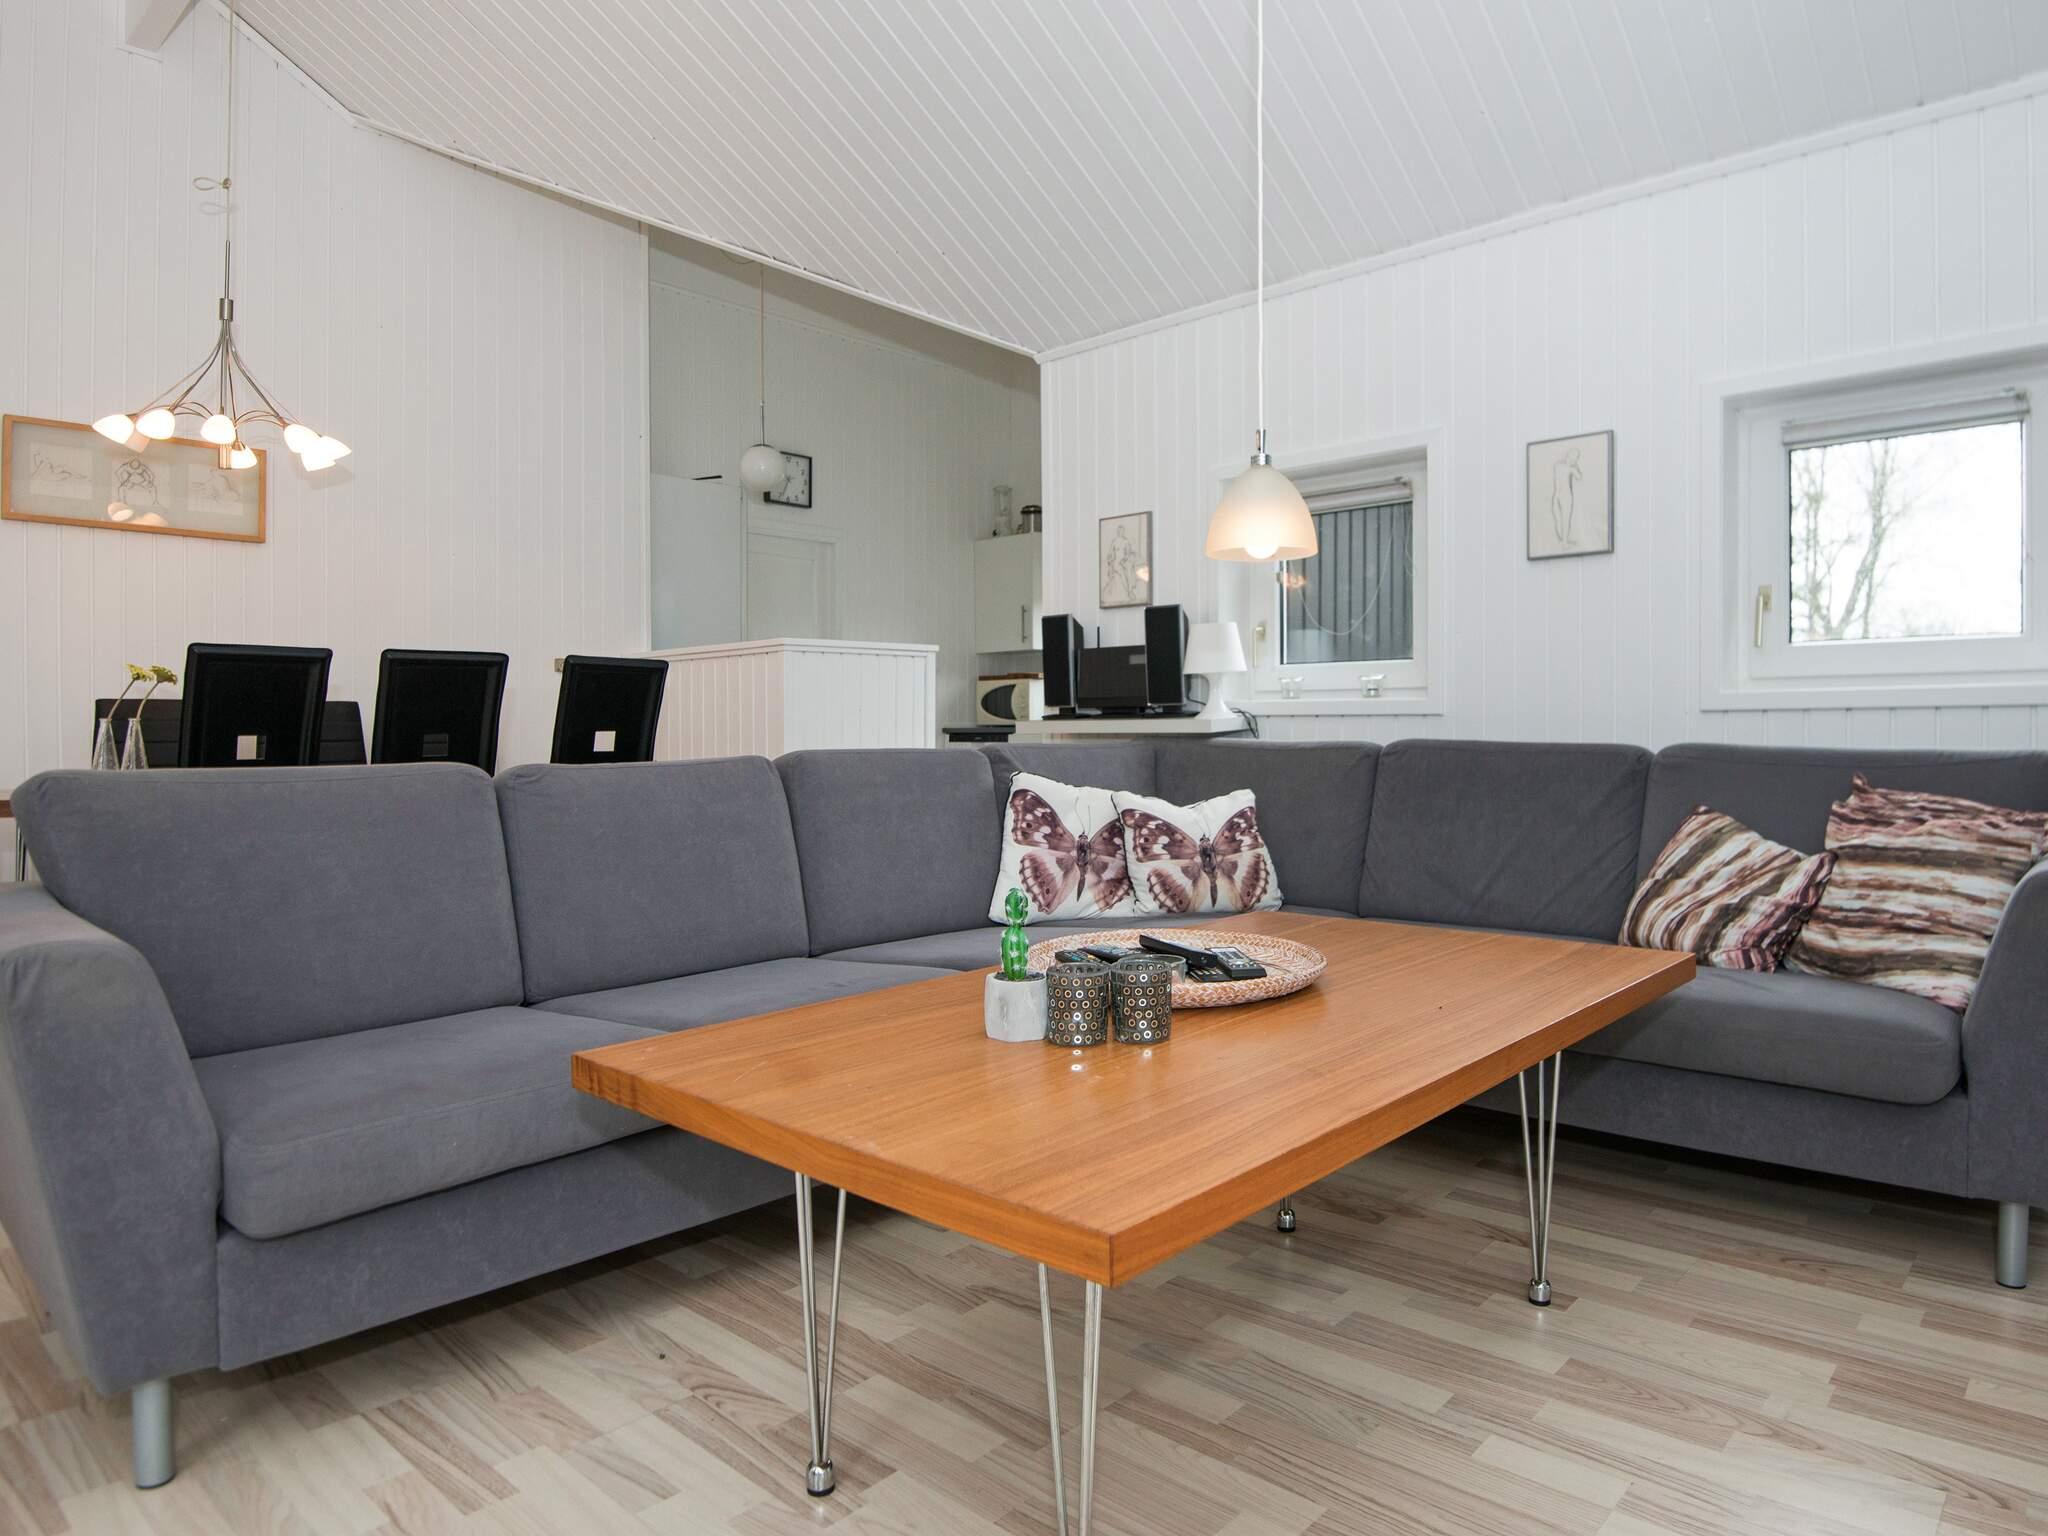 Ferienhaus Lyngsbæk Strand (493348), Ebeltoft, , Ostjütland, Dänemark, Bild 4